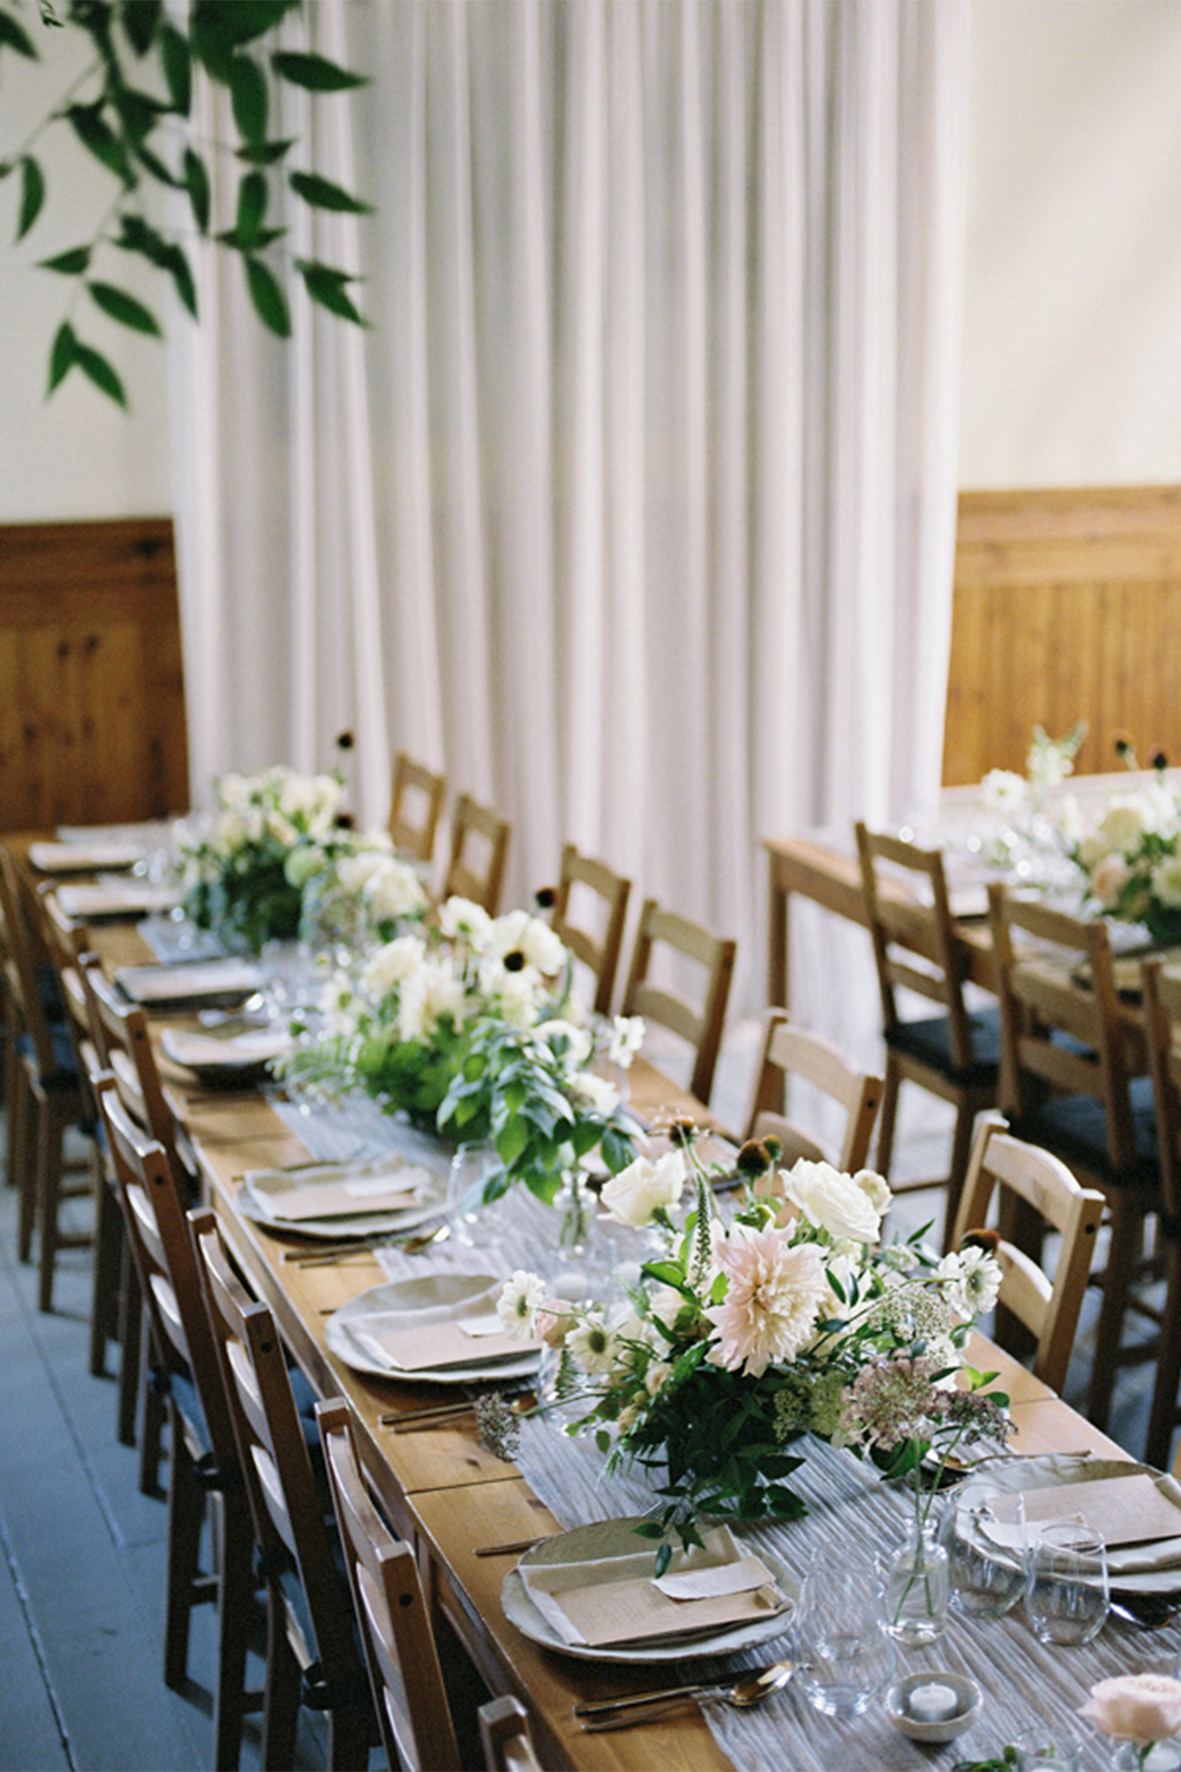 Vilhelmiina & Mark's Summer Wedding at Villa Vuosanta